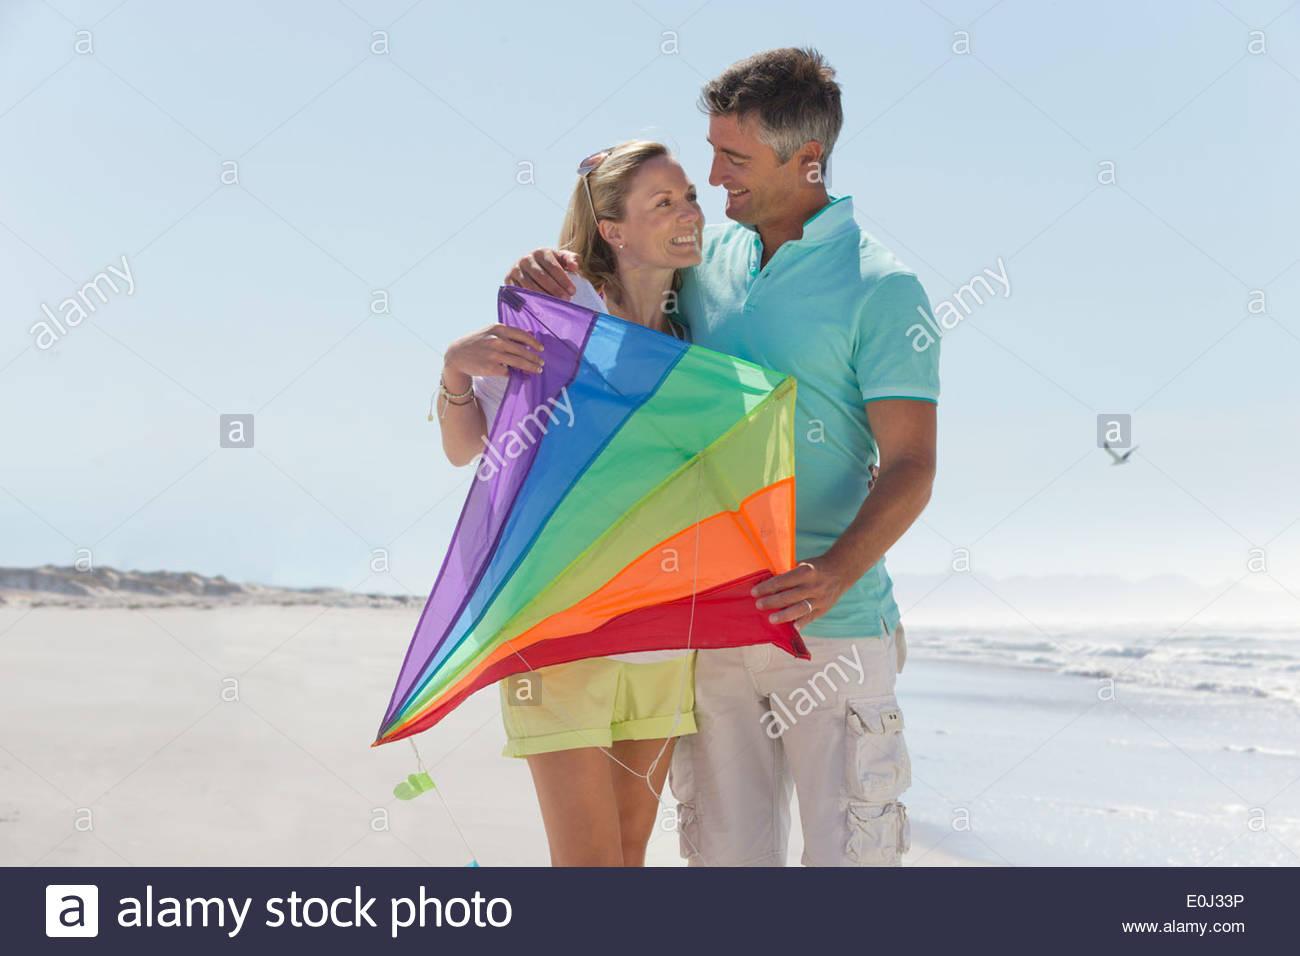 Happy couple holding kite on sunny beach - Stock Image